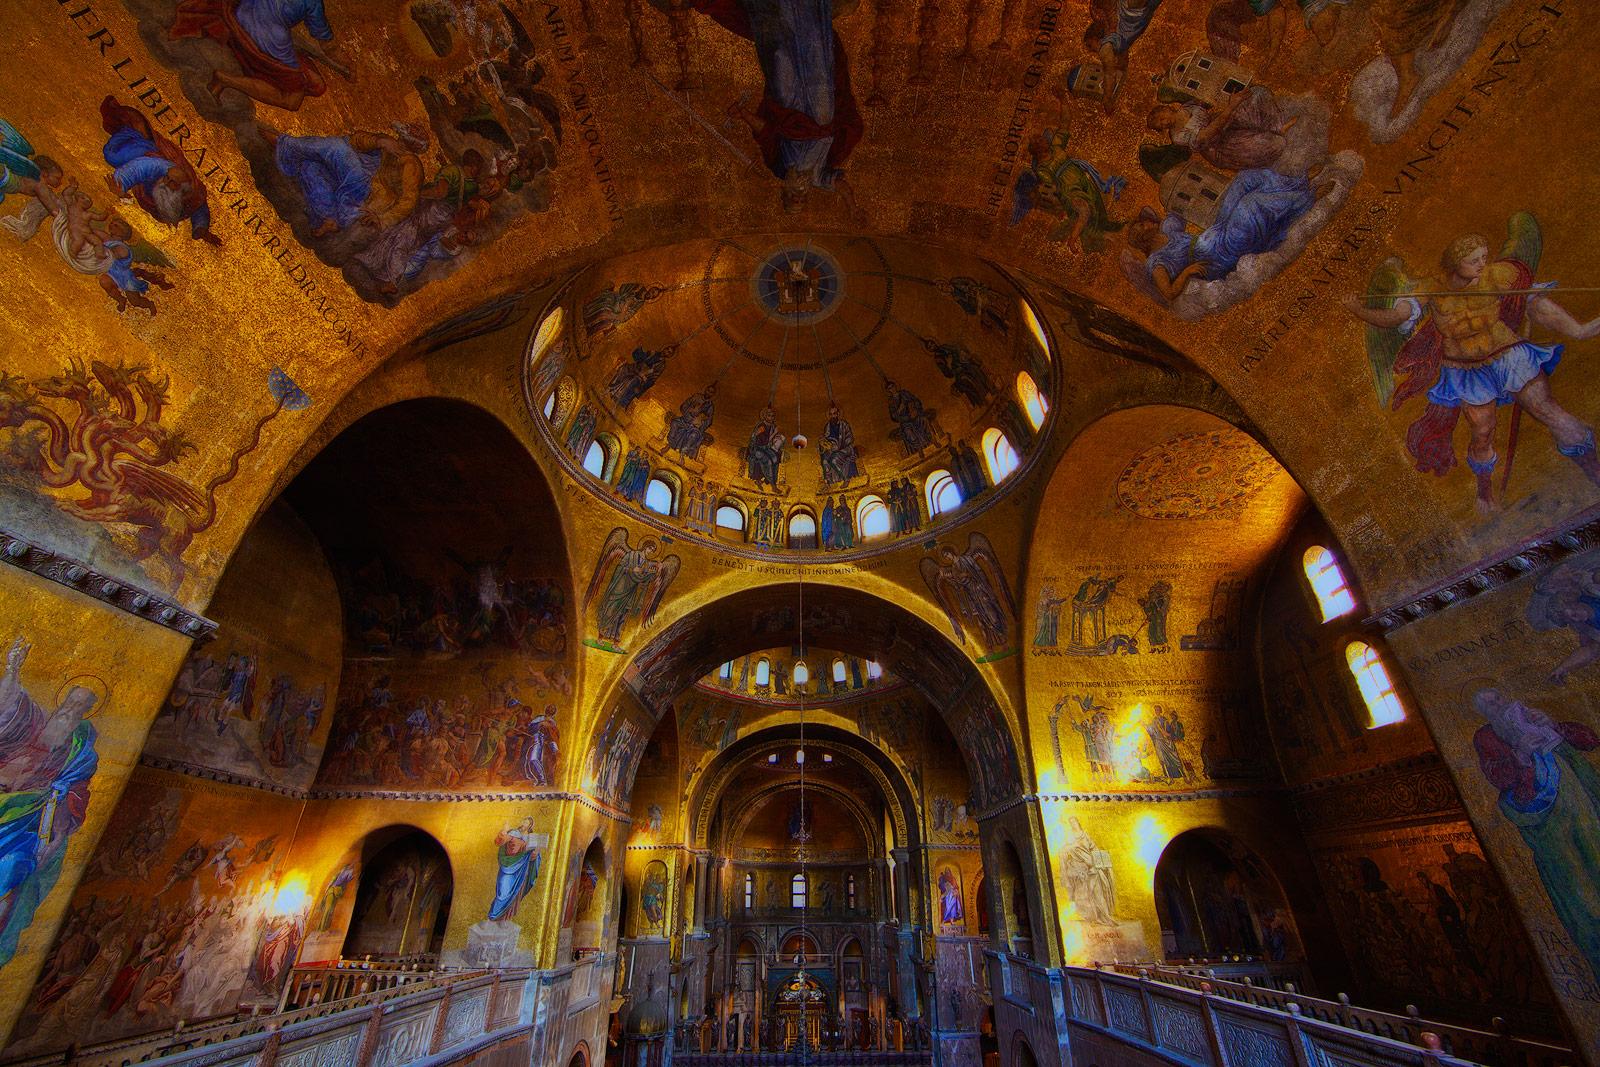 carnival, cathedral, celebration, colorful, costume, europe, horizontal, italy, mask, party, saint mark's basilica, san marco, st. mark's basilica, venice, photo